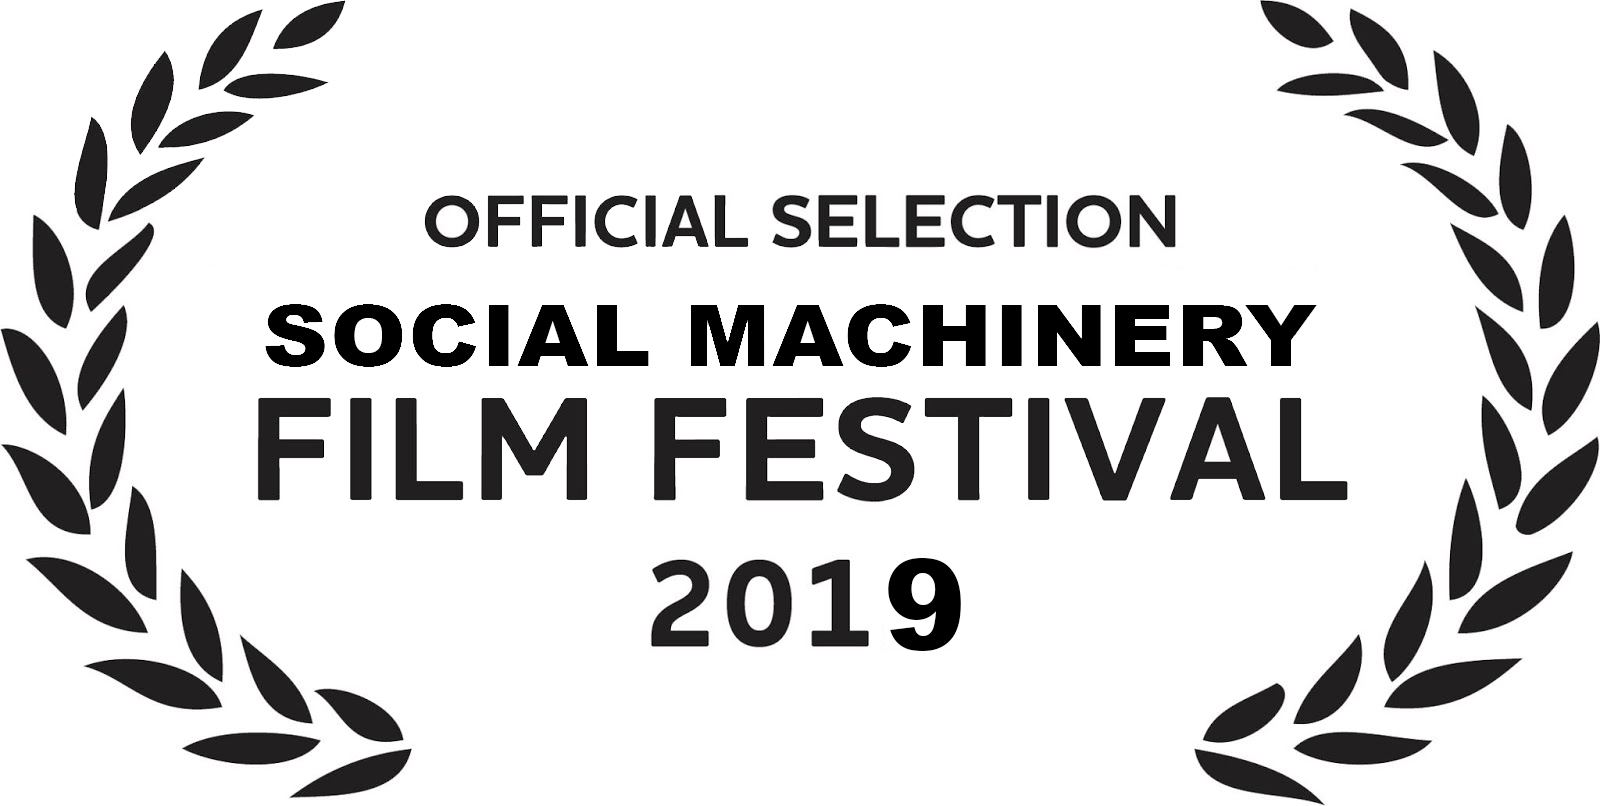 Laurels for Social Machinery Film Fest.jpg